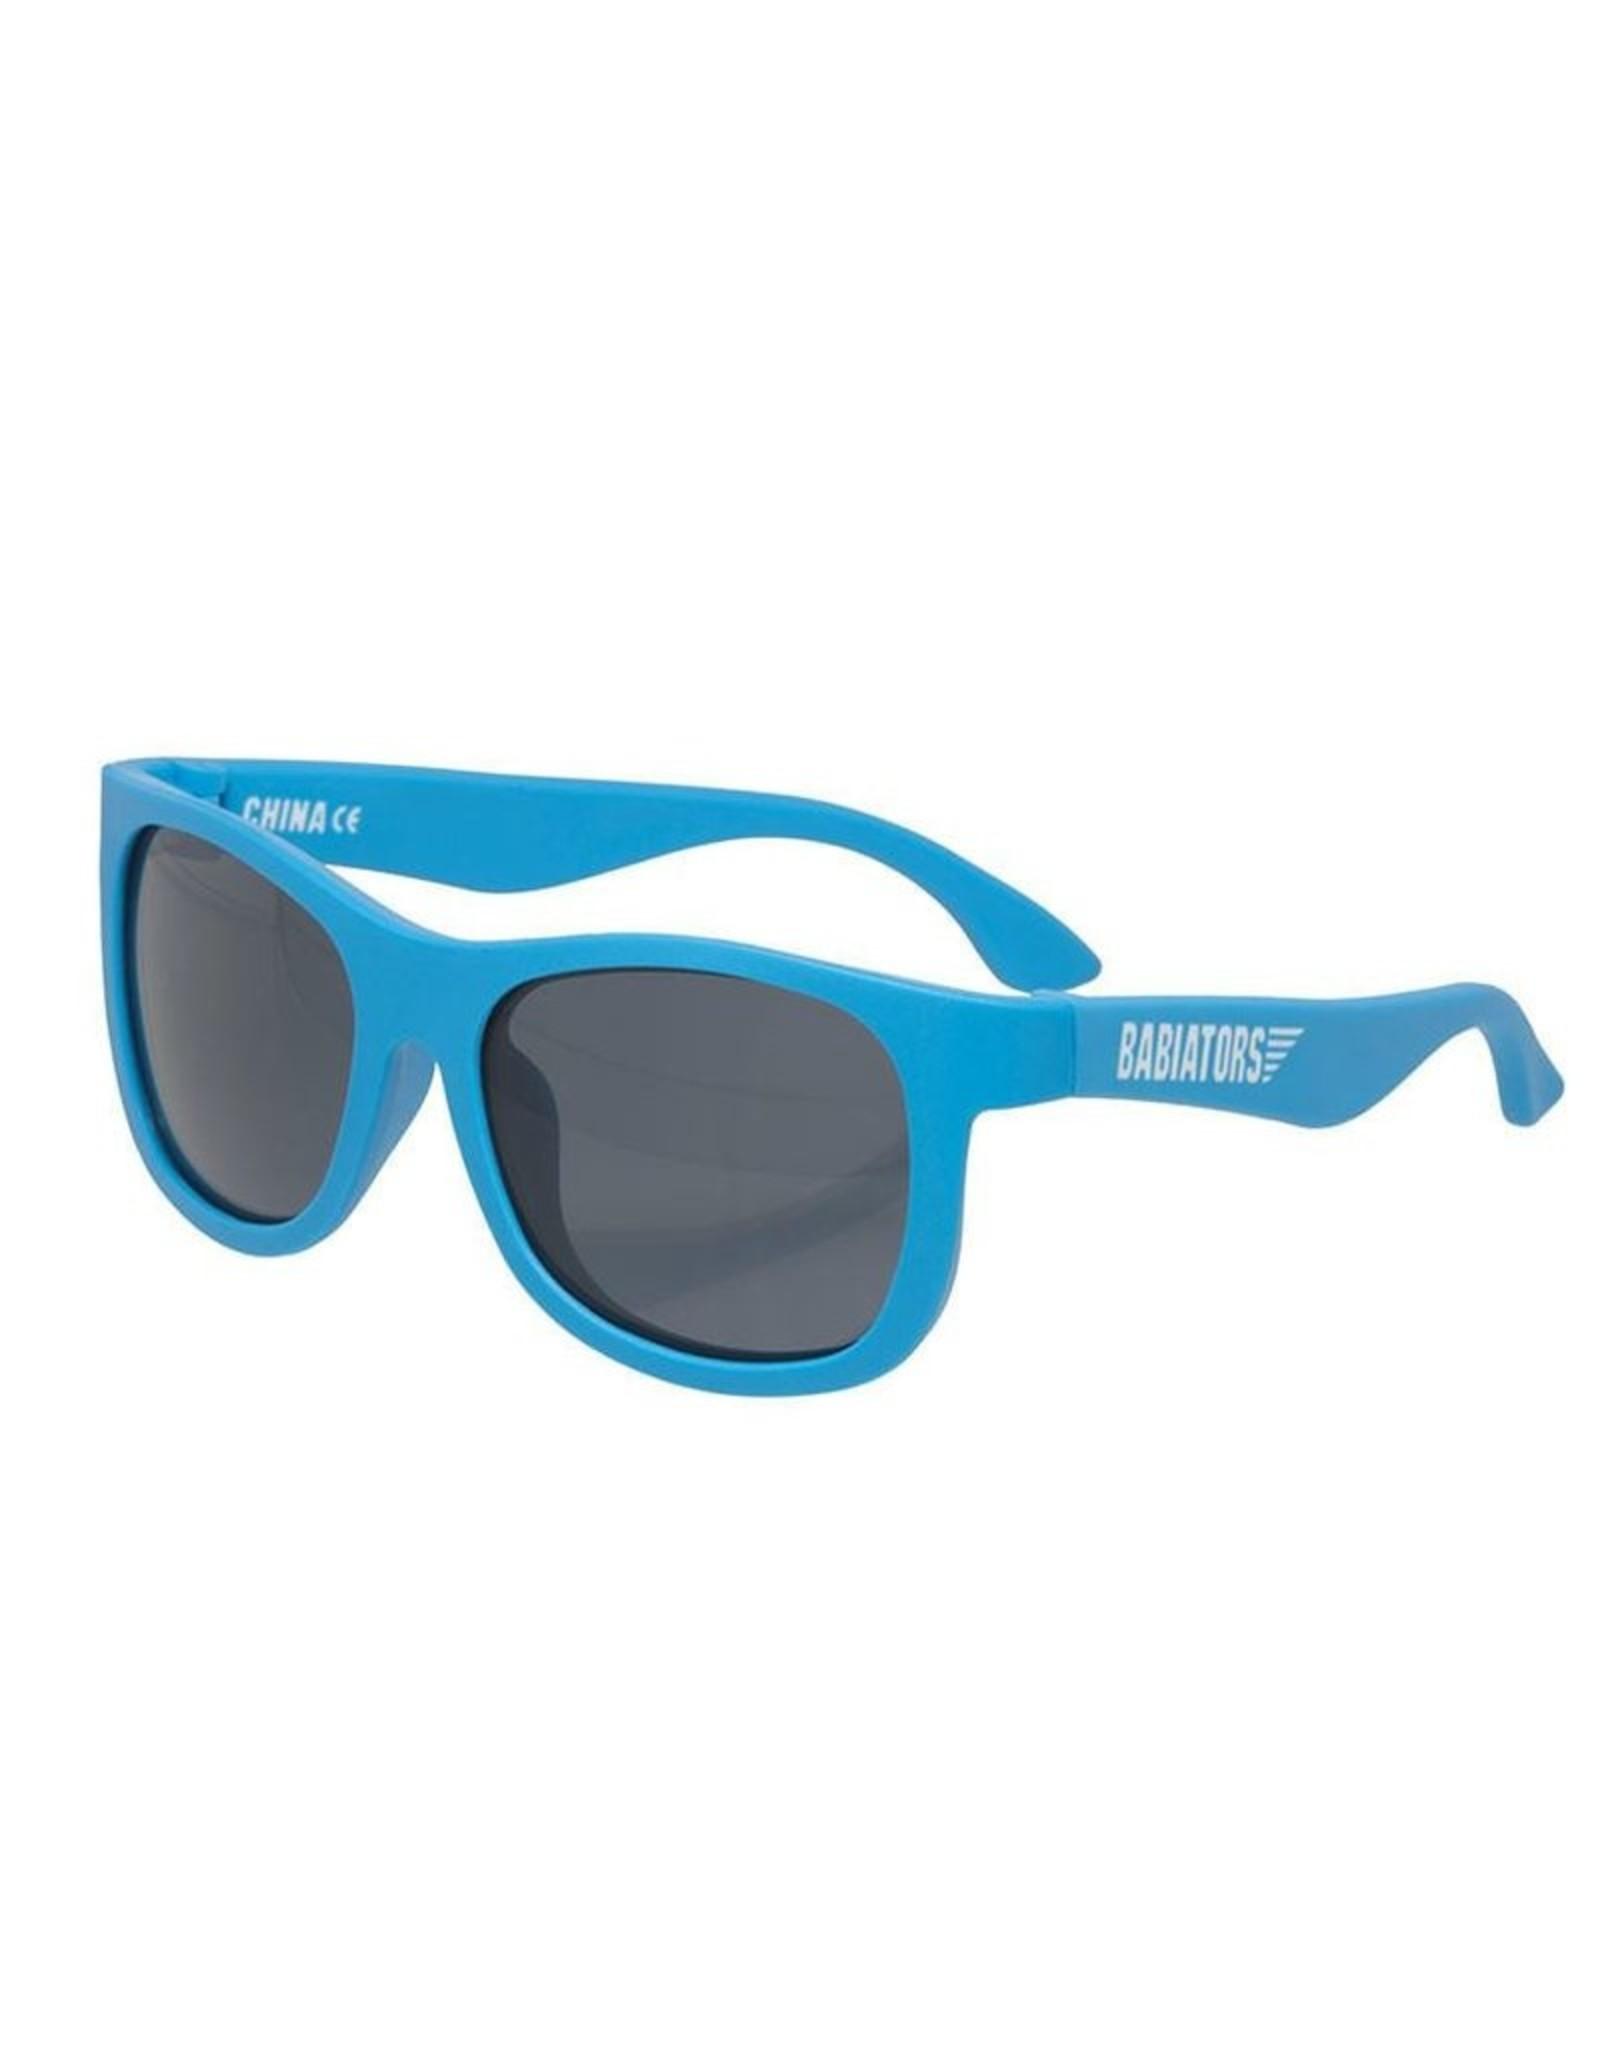 Finn + Emma Babiators, Premium Sunglasses